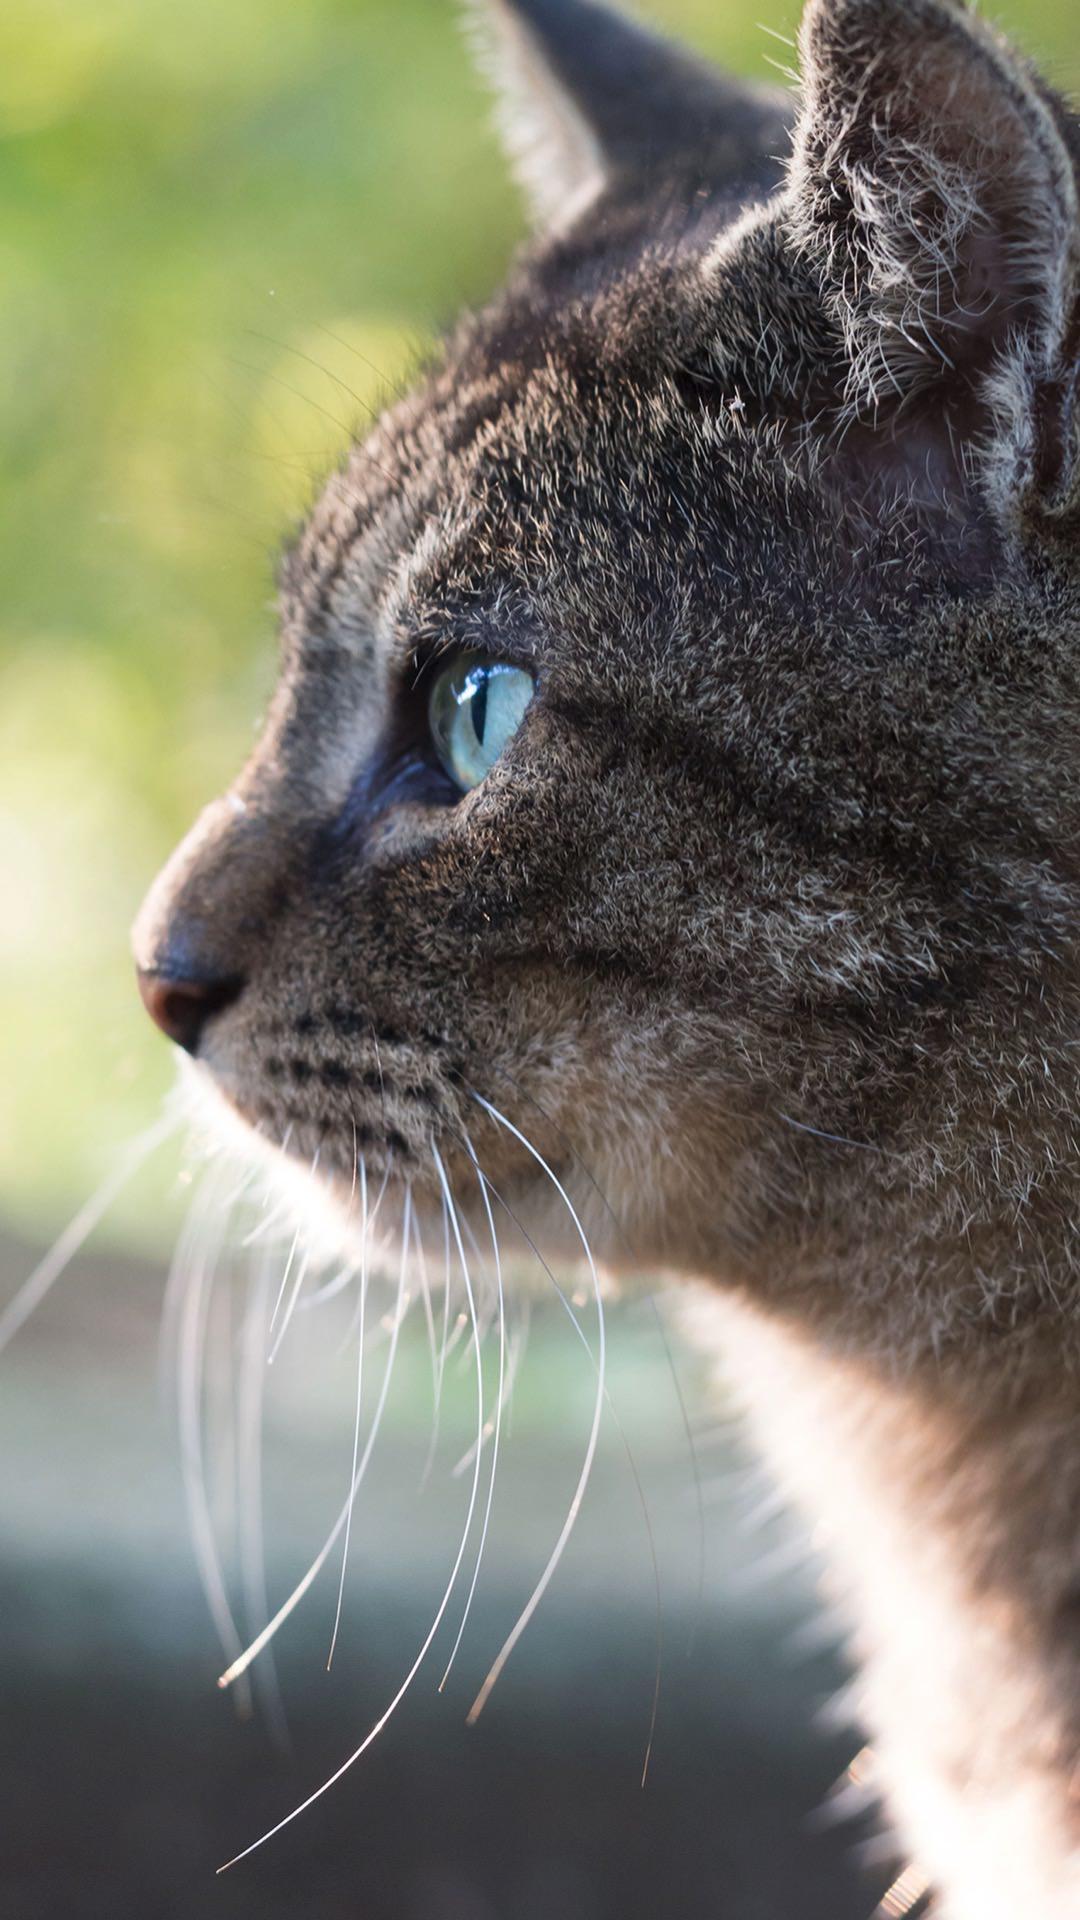 Unduh 93+  Gambar Kucing Lucu Wallpaper Terbaik